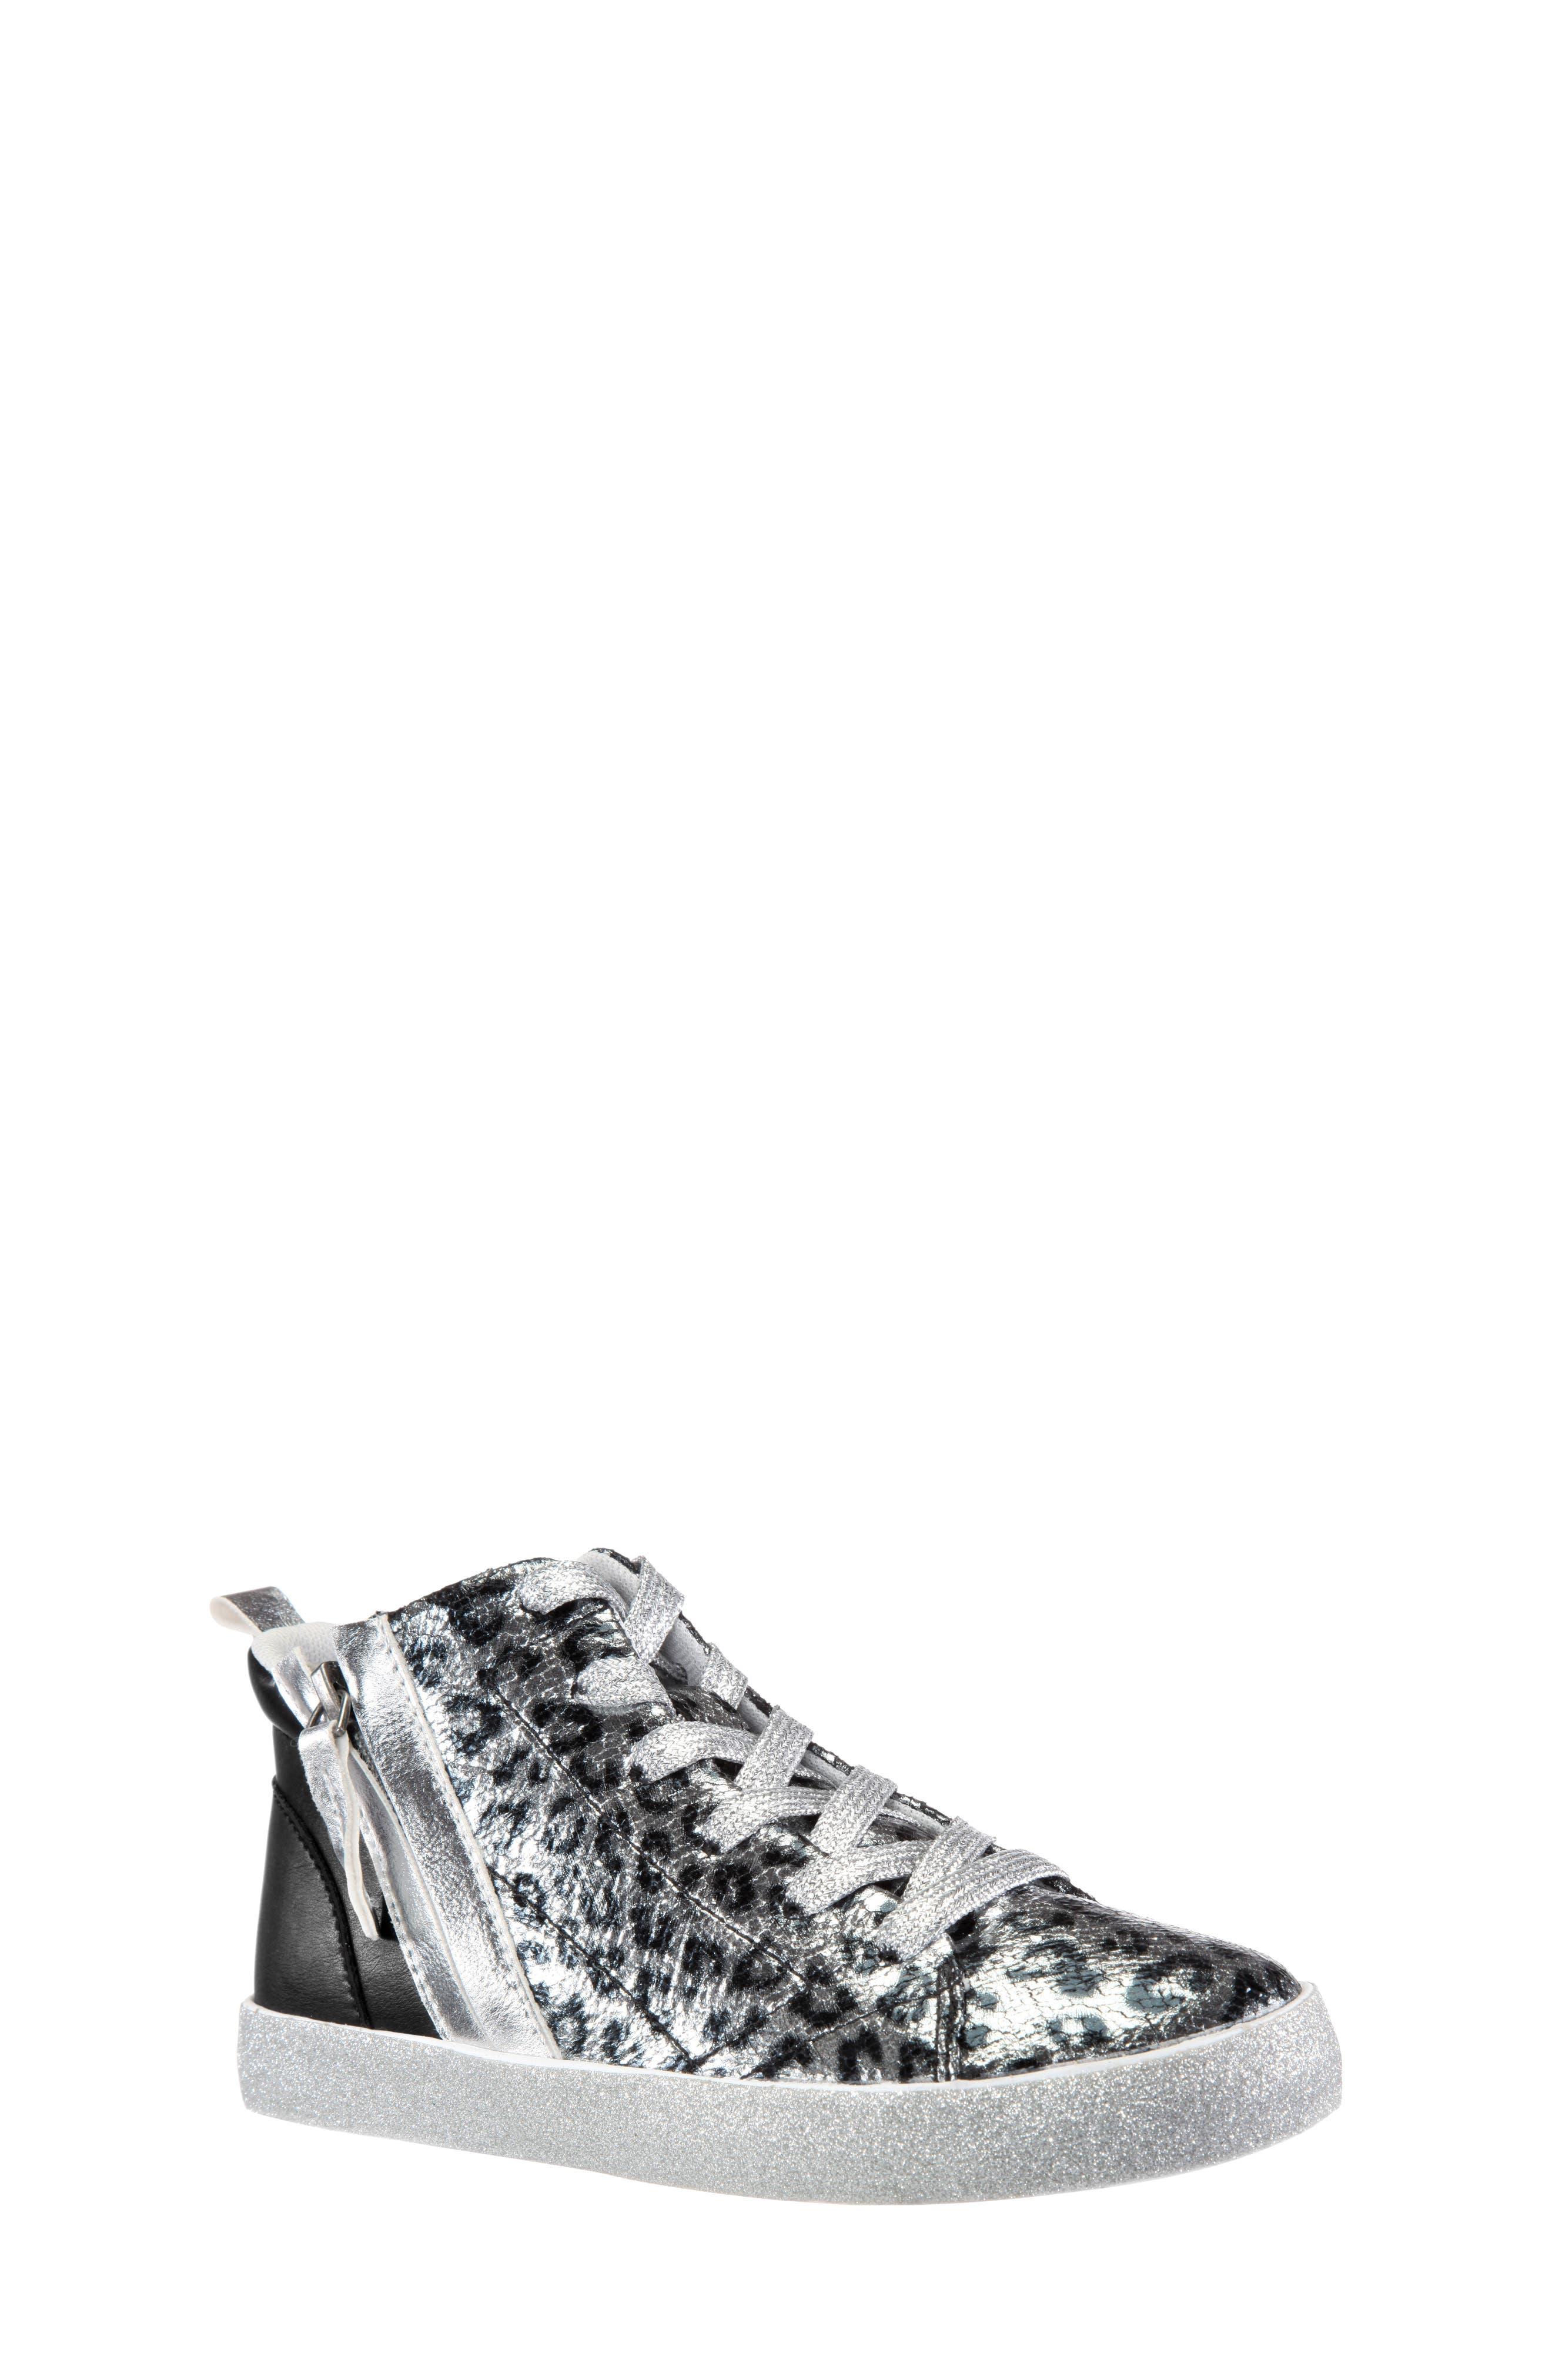 Toddler Girls Nina Jossie2 Metallic Leopard Print High Top Sneaker Size 9 M  Metallic